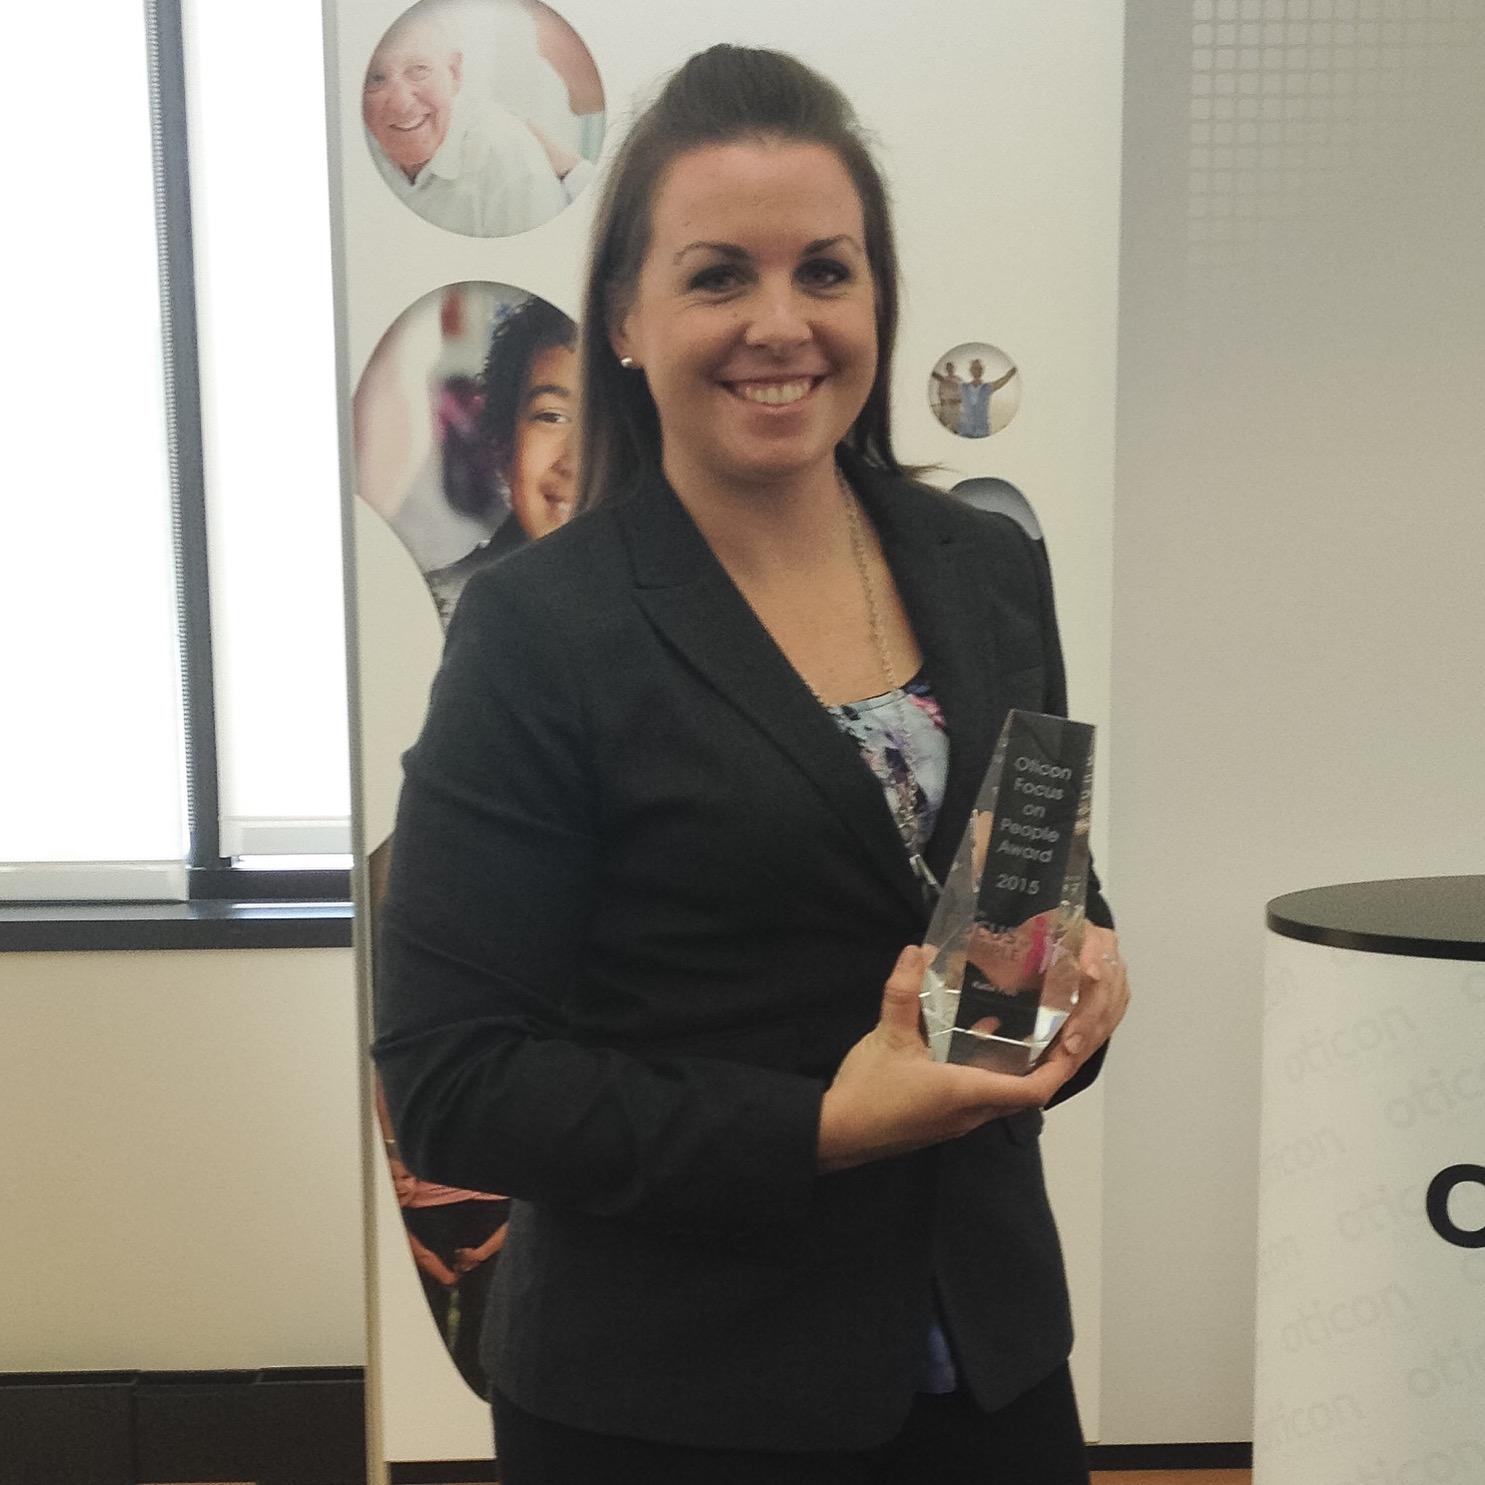 Katie Fish - Focus on People Award